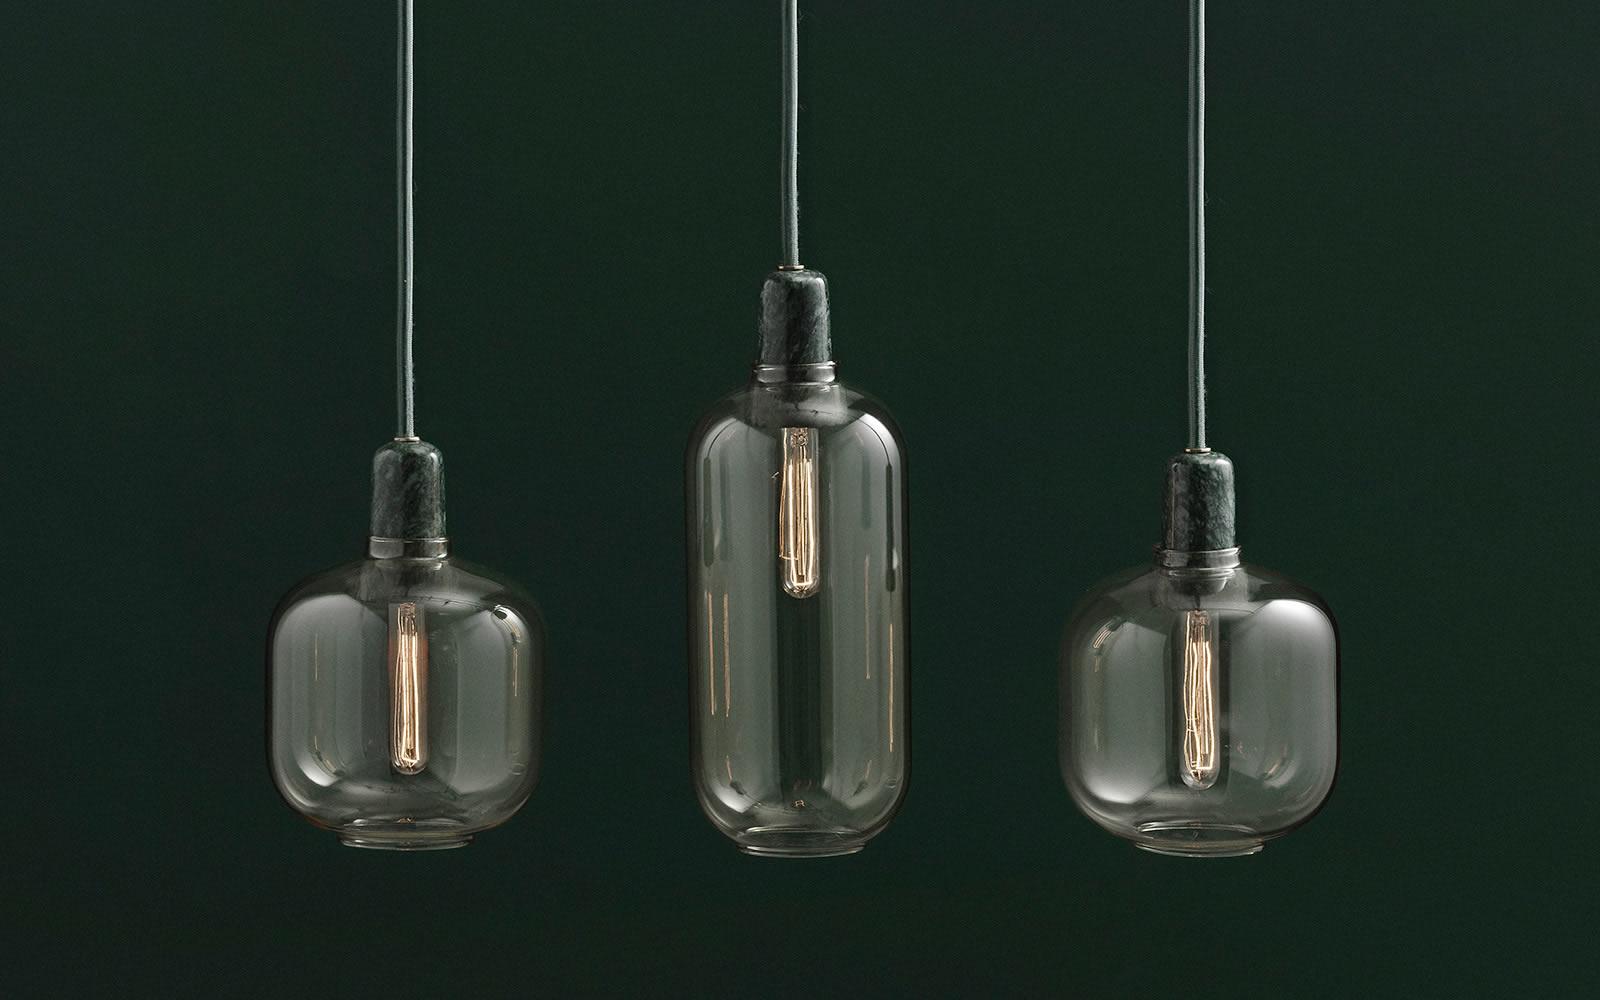 amp lamps by simon legald for normann copenhagen sohomod. Black Bedroom Furniture Sets. Home Design Ideas